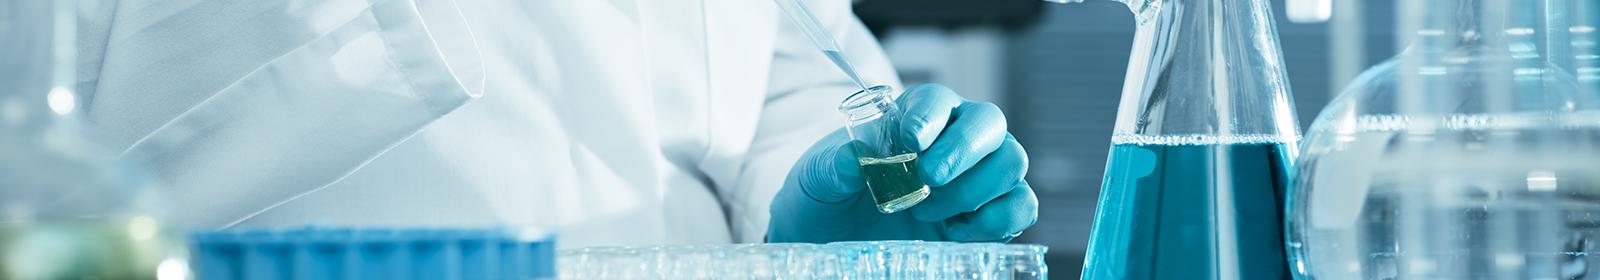 Medical & Biotech